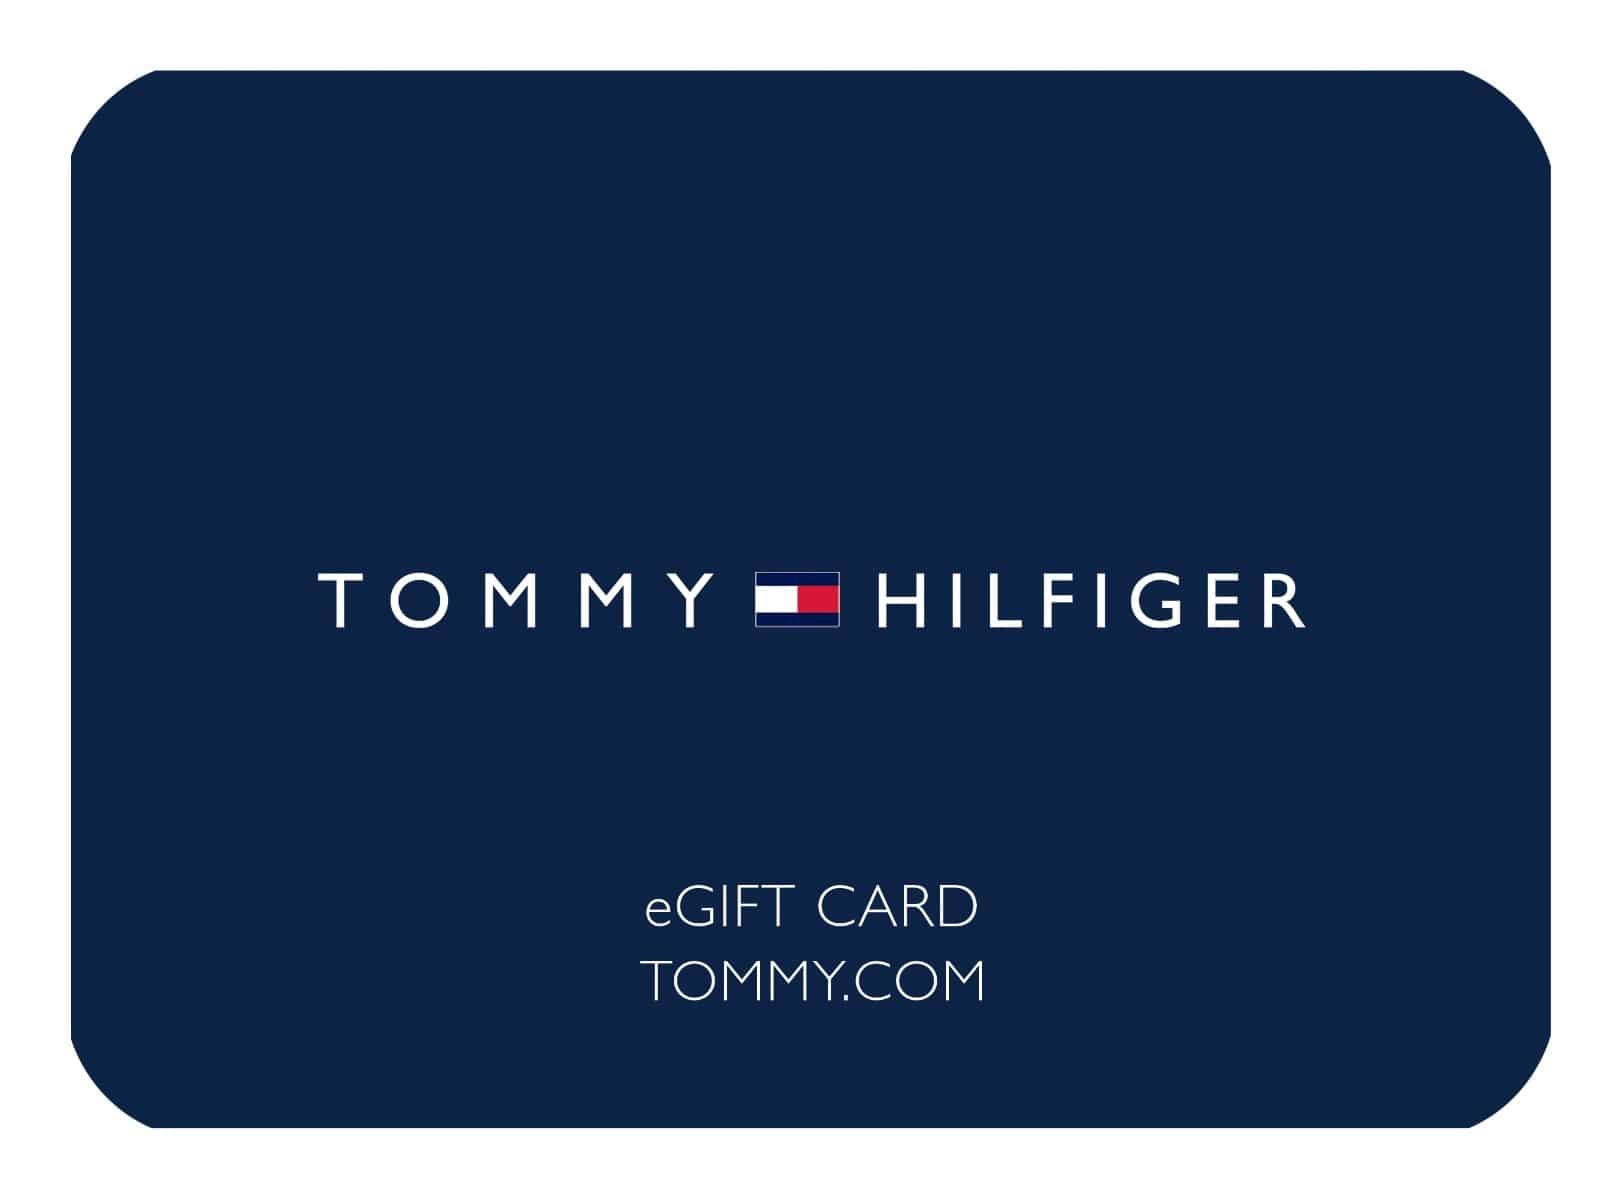 GIFT-CARD,GIFT-CARD